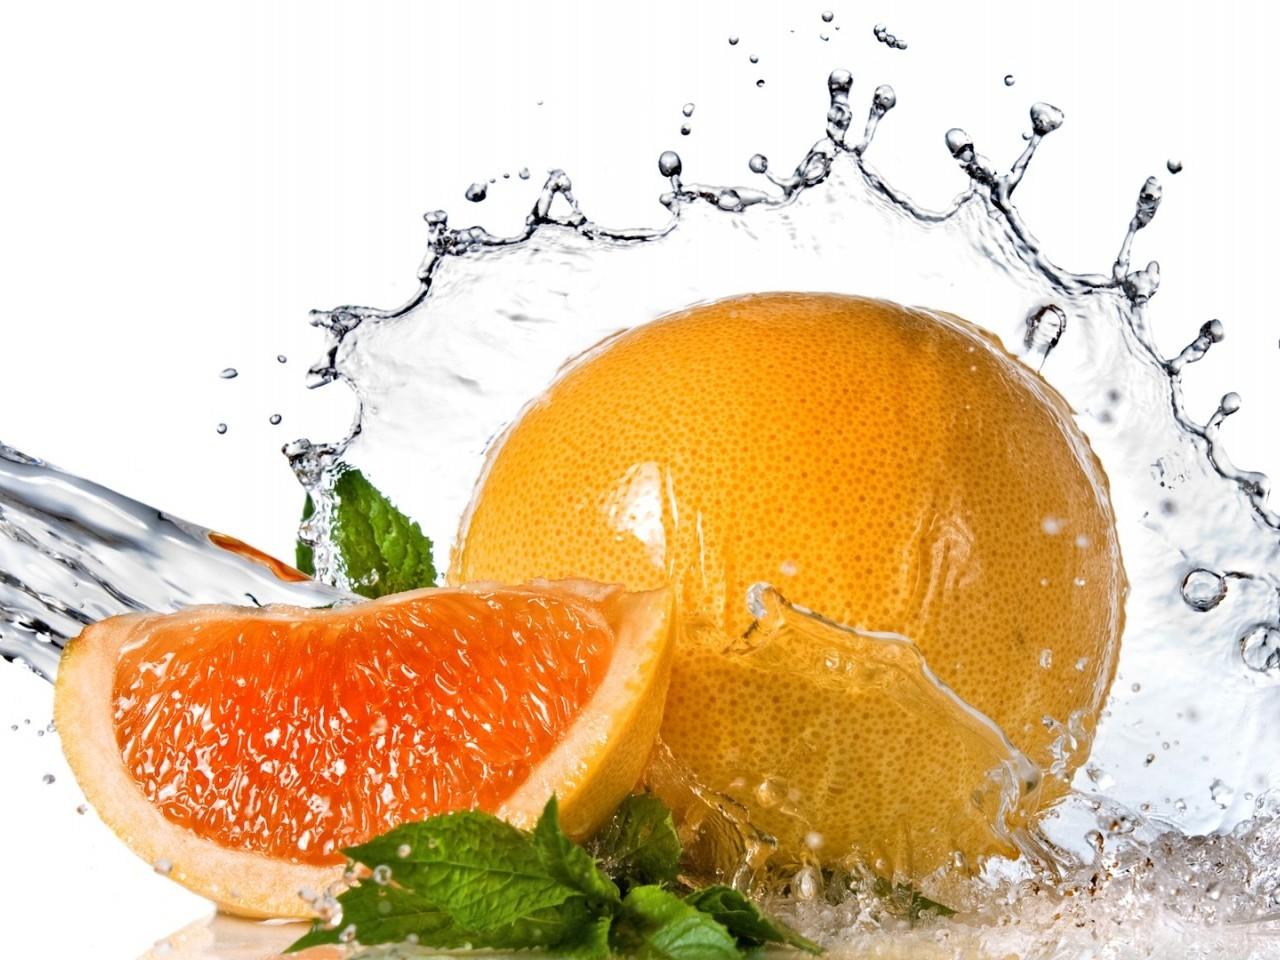 http://4.bp.blogspot.com/-JUe5C3nIgps/T92WX0xuNJI/AAAAAAAAAcc/BRr0wXIl-YA/s1600/orange-splash-1280x960.jpg